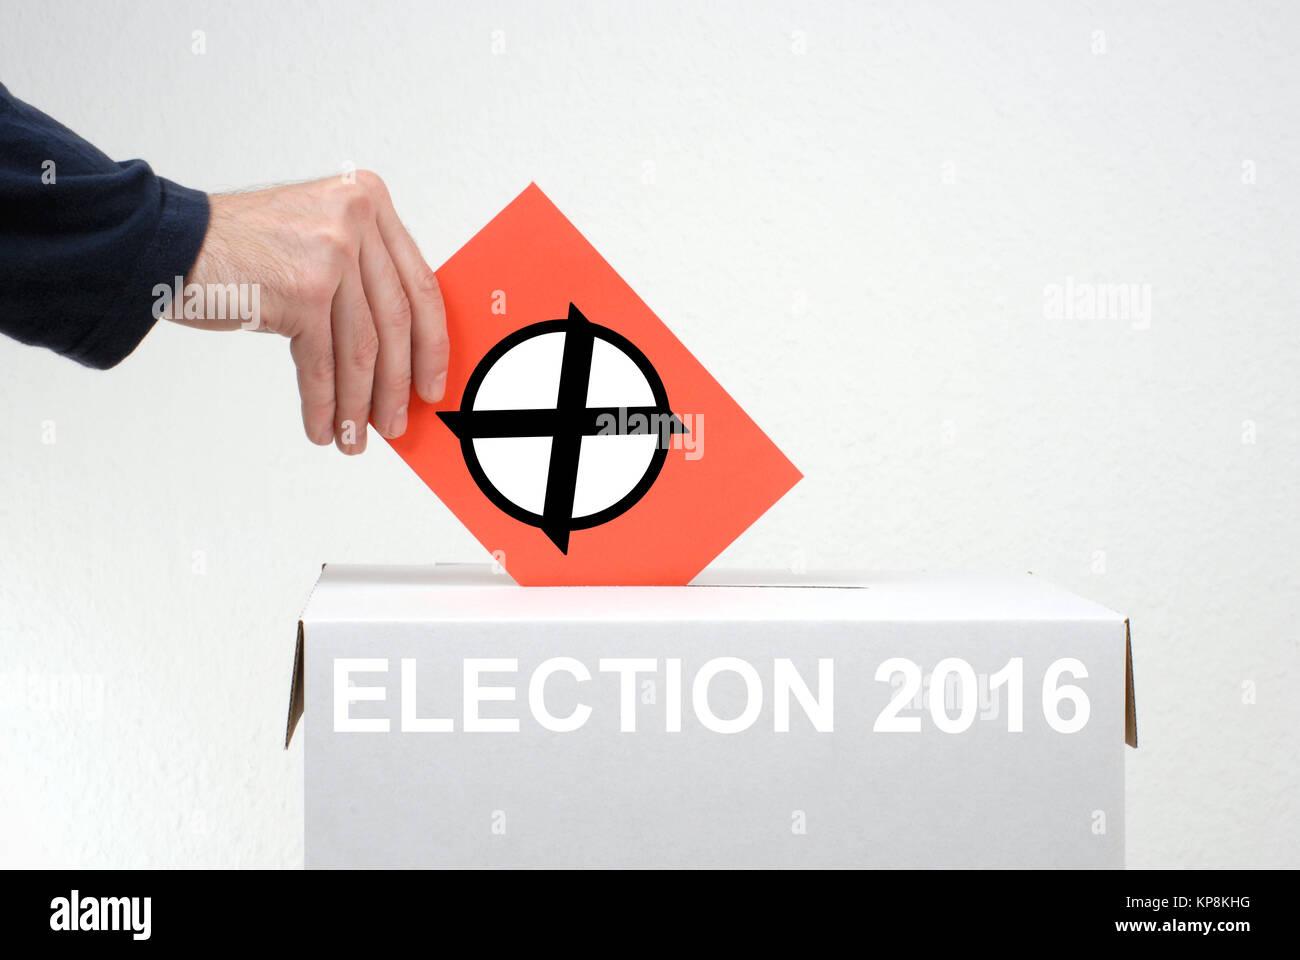 election 2016 - Stock Image